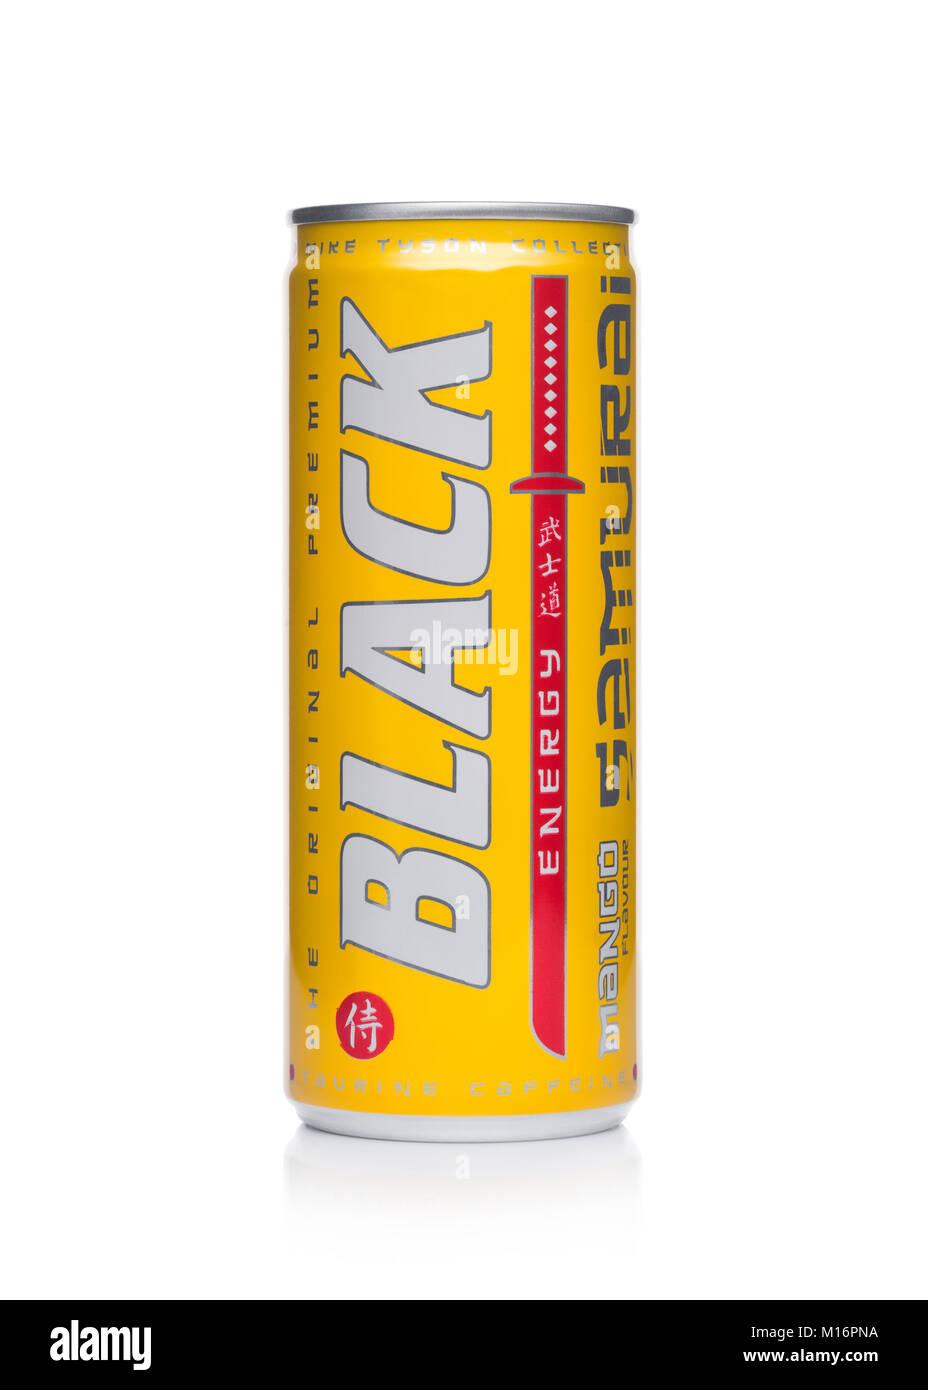 LONDON, UK - JANUARY 24, 2018: Aluminium can of Black Energy Drink Samurai Edition with mango flavor on white background.Leader - Stock Image